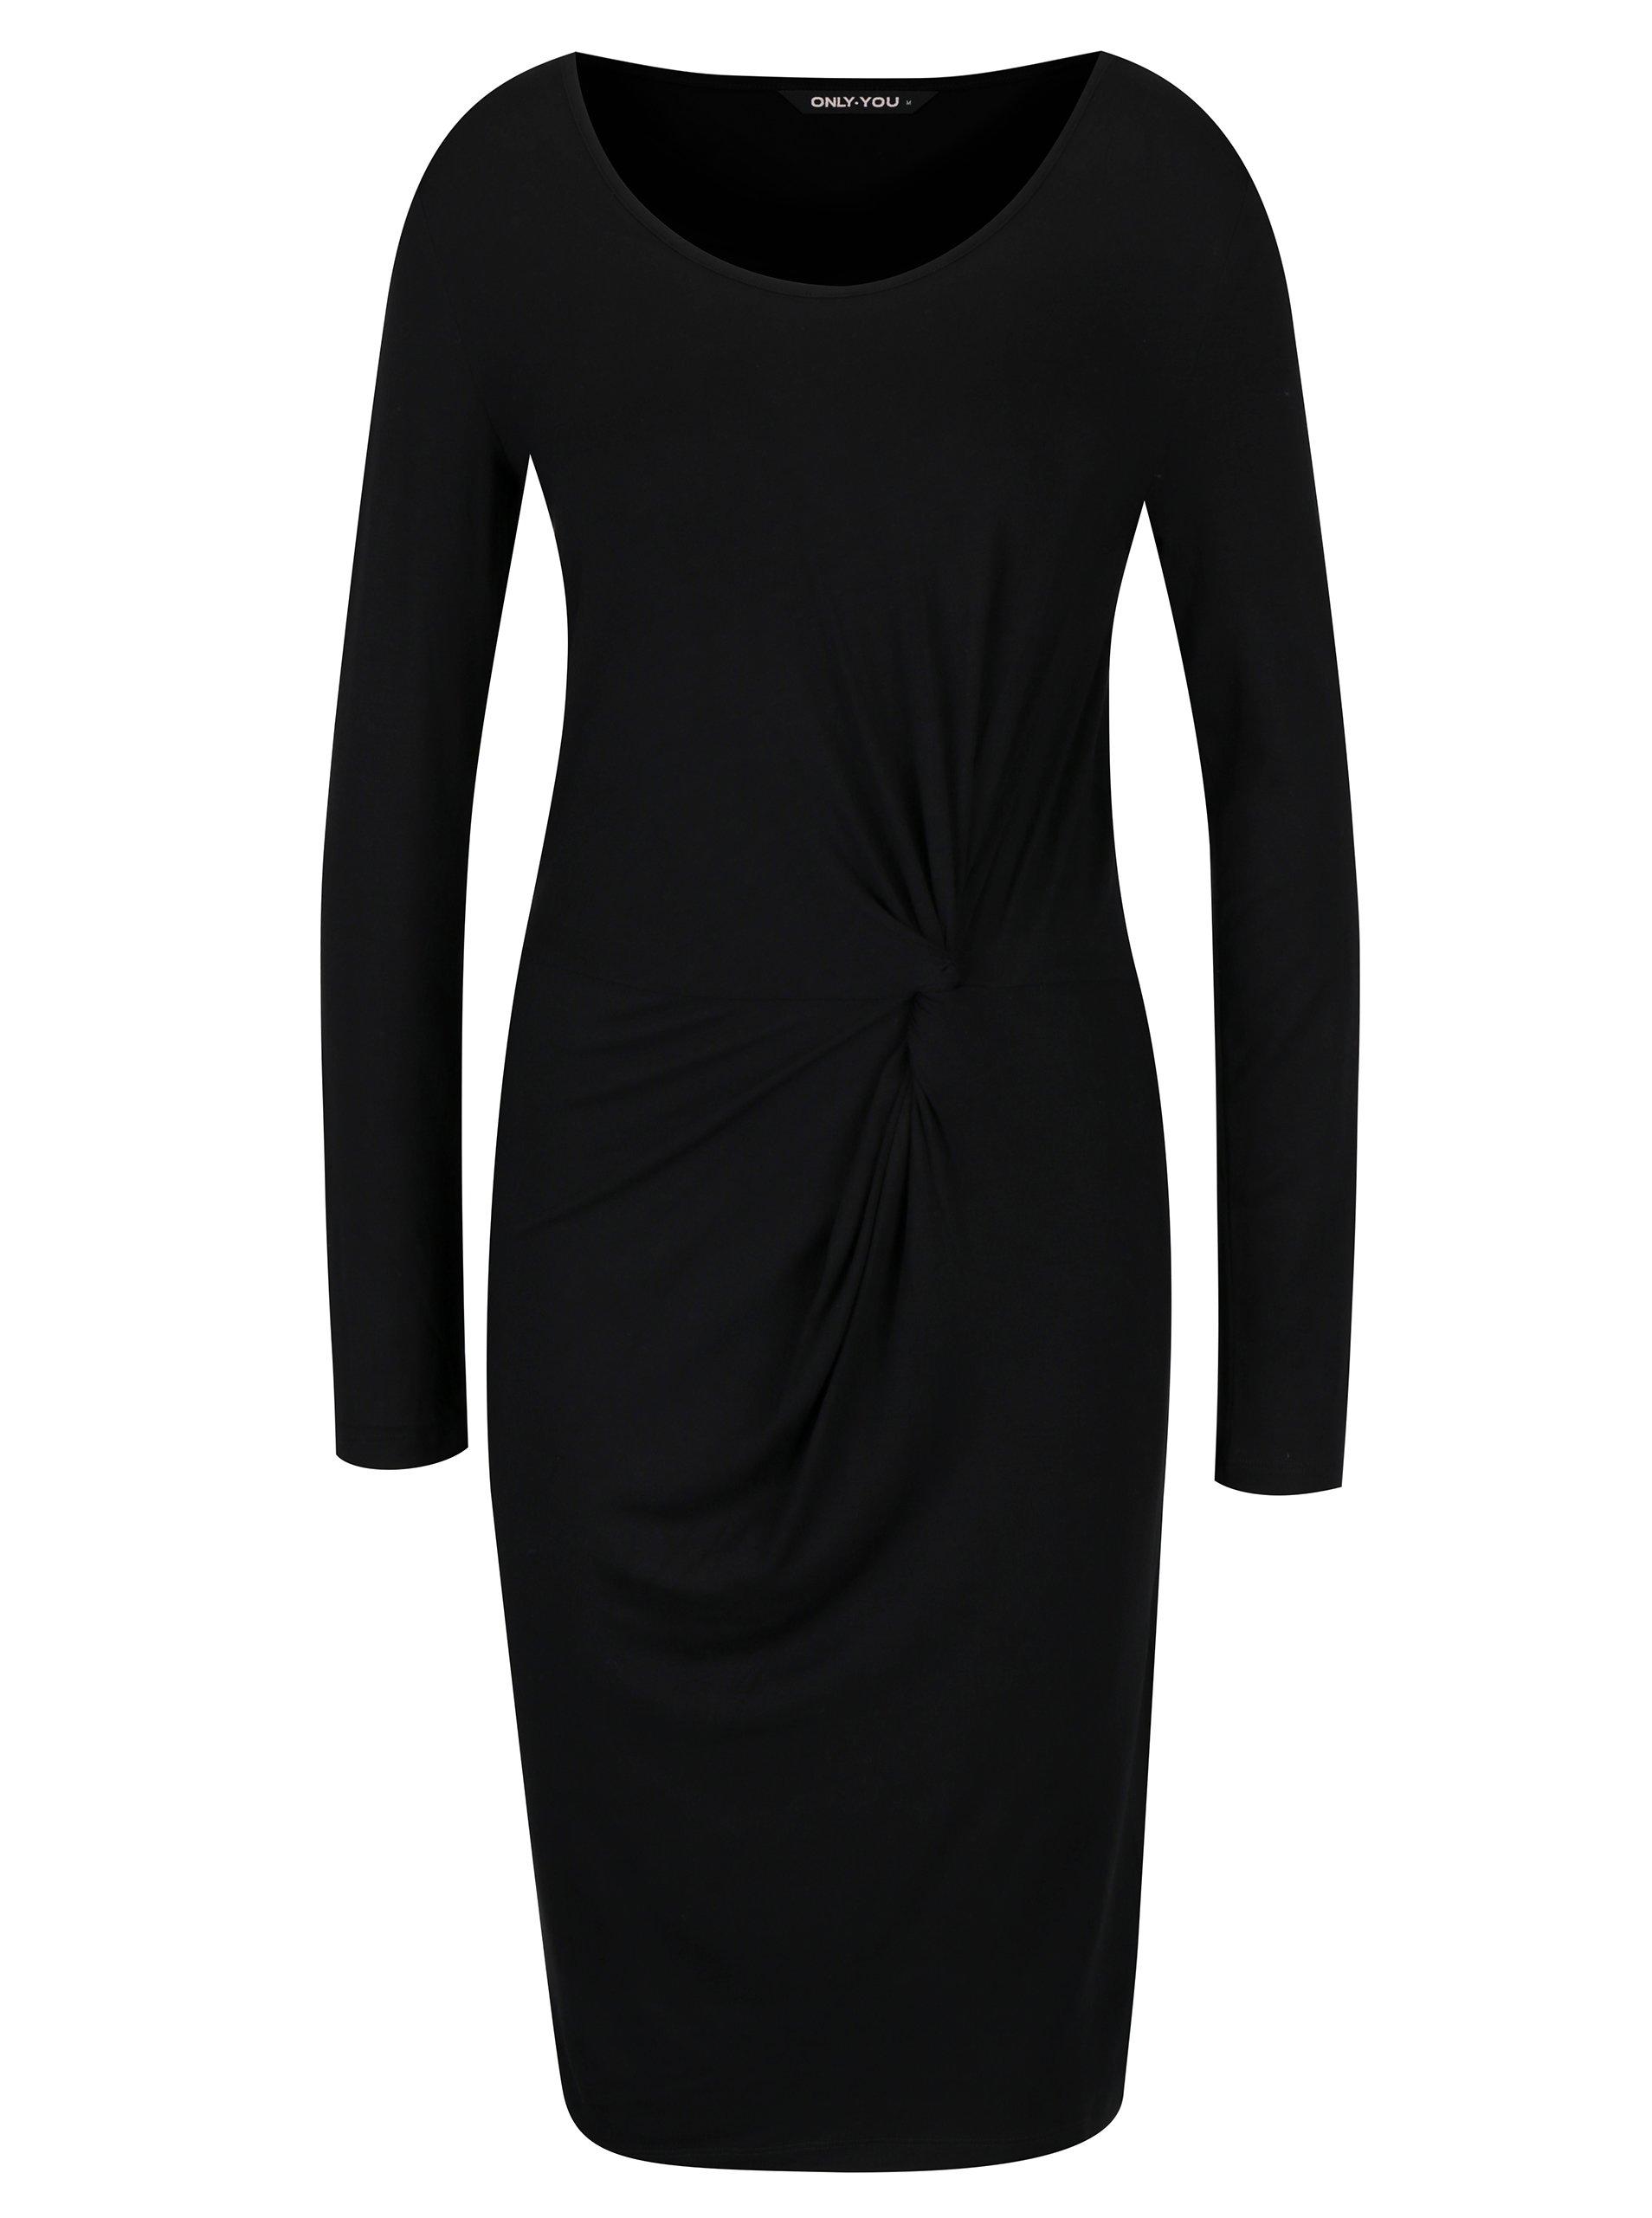 7191fc6182a9 Čierne šaty s nazberkaním ONLY Rina